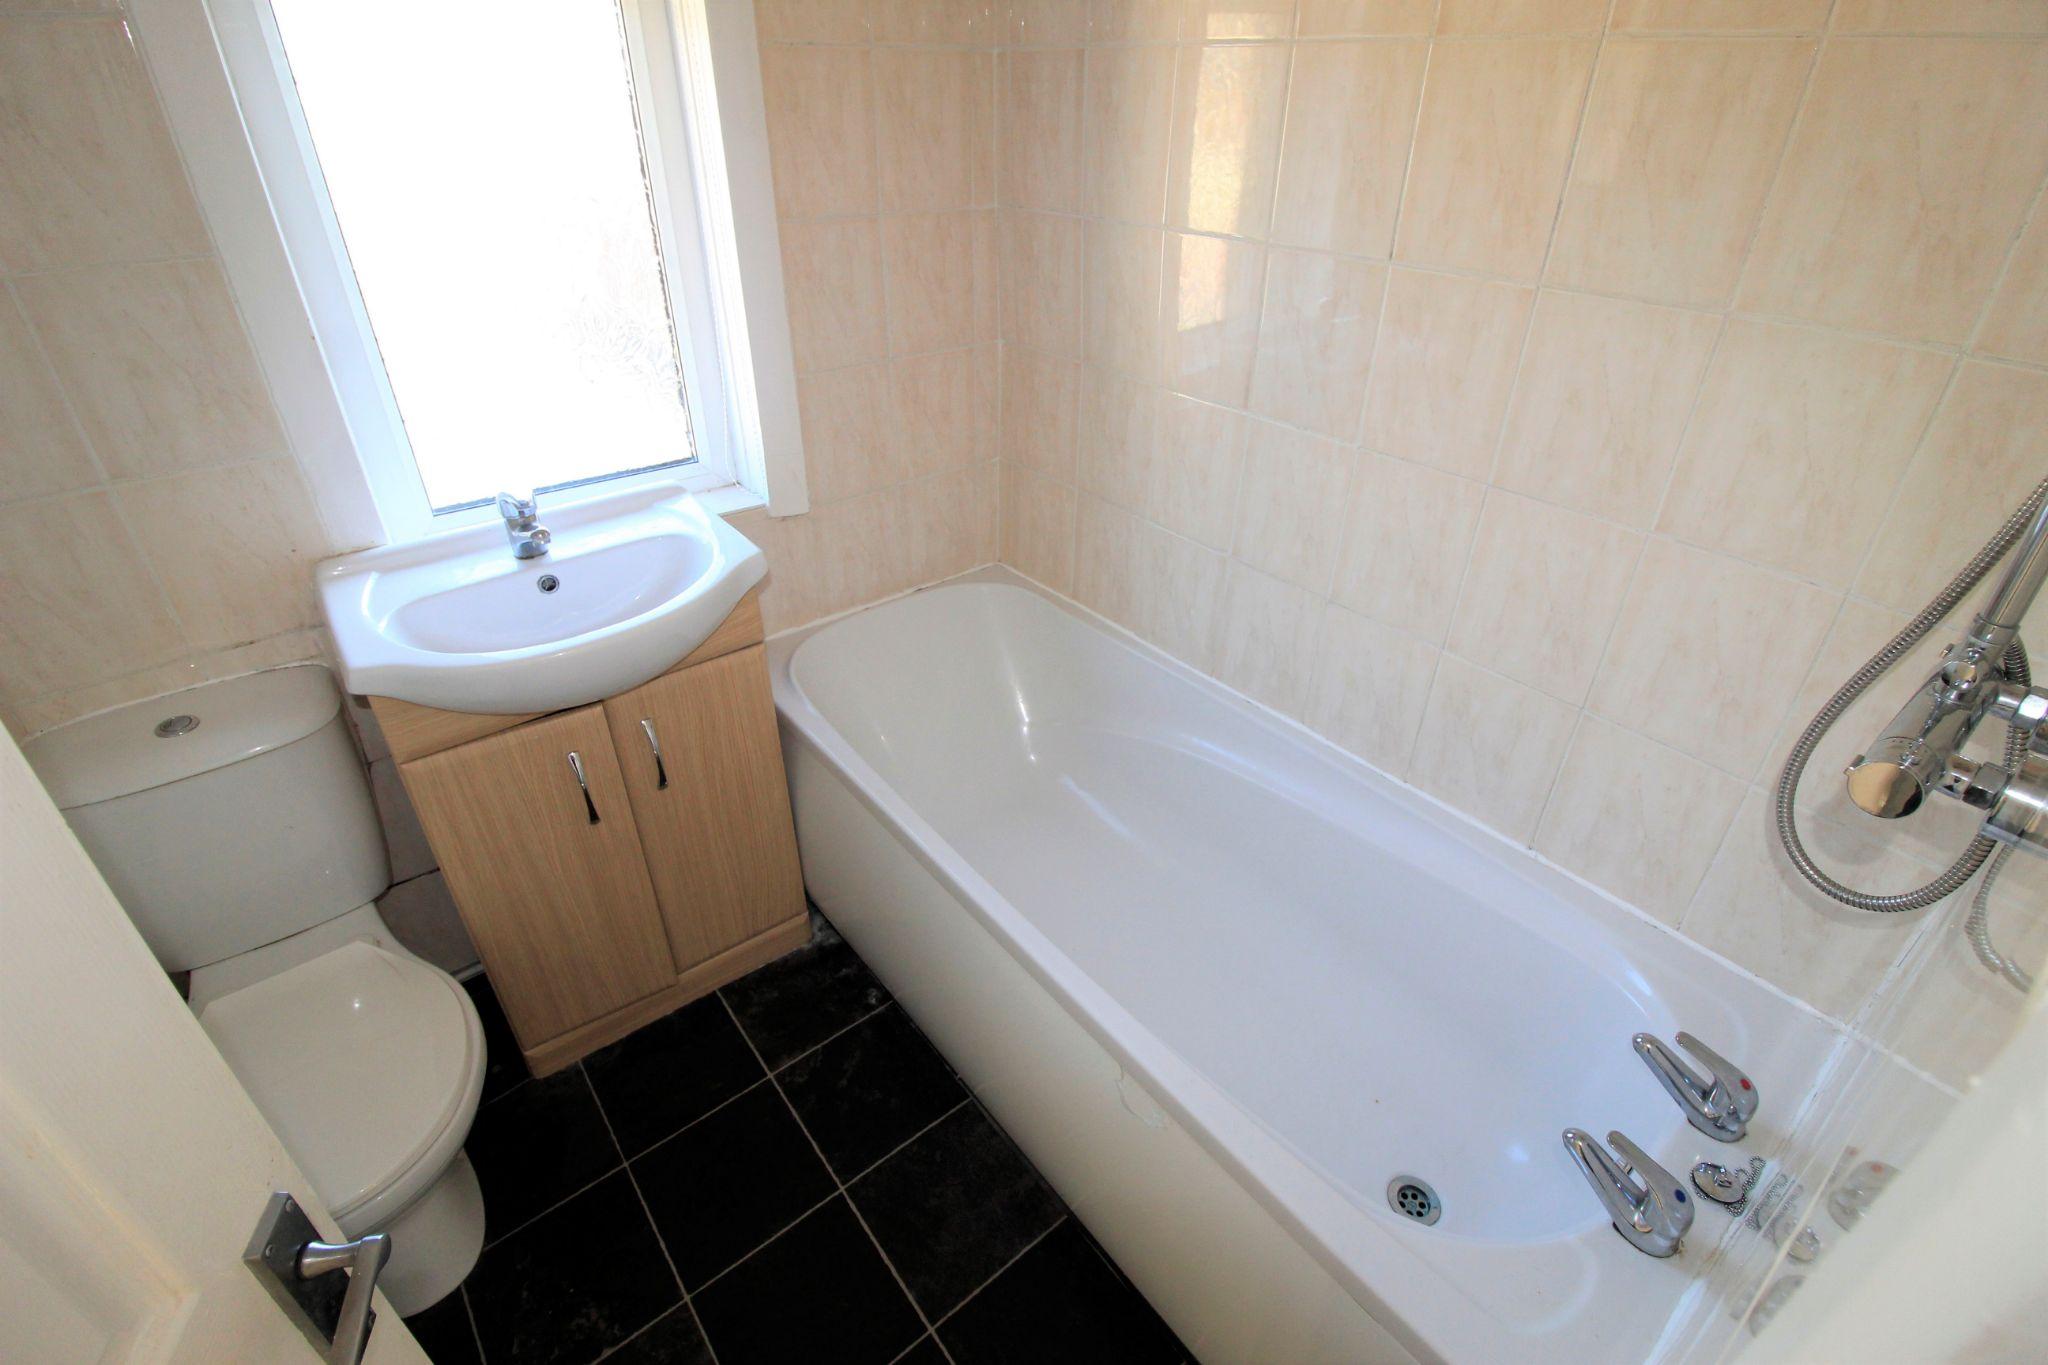 2 bedroom semi-detached house Let in Bradford - Bathroom